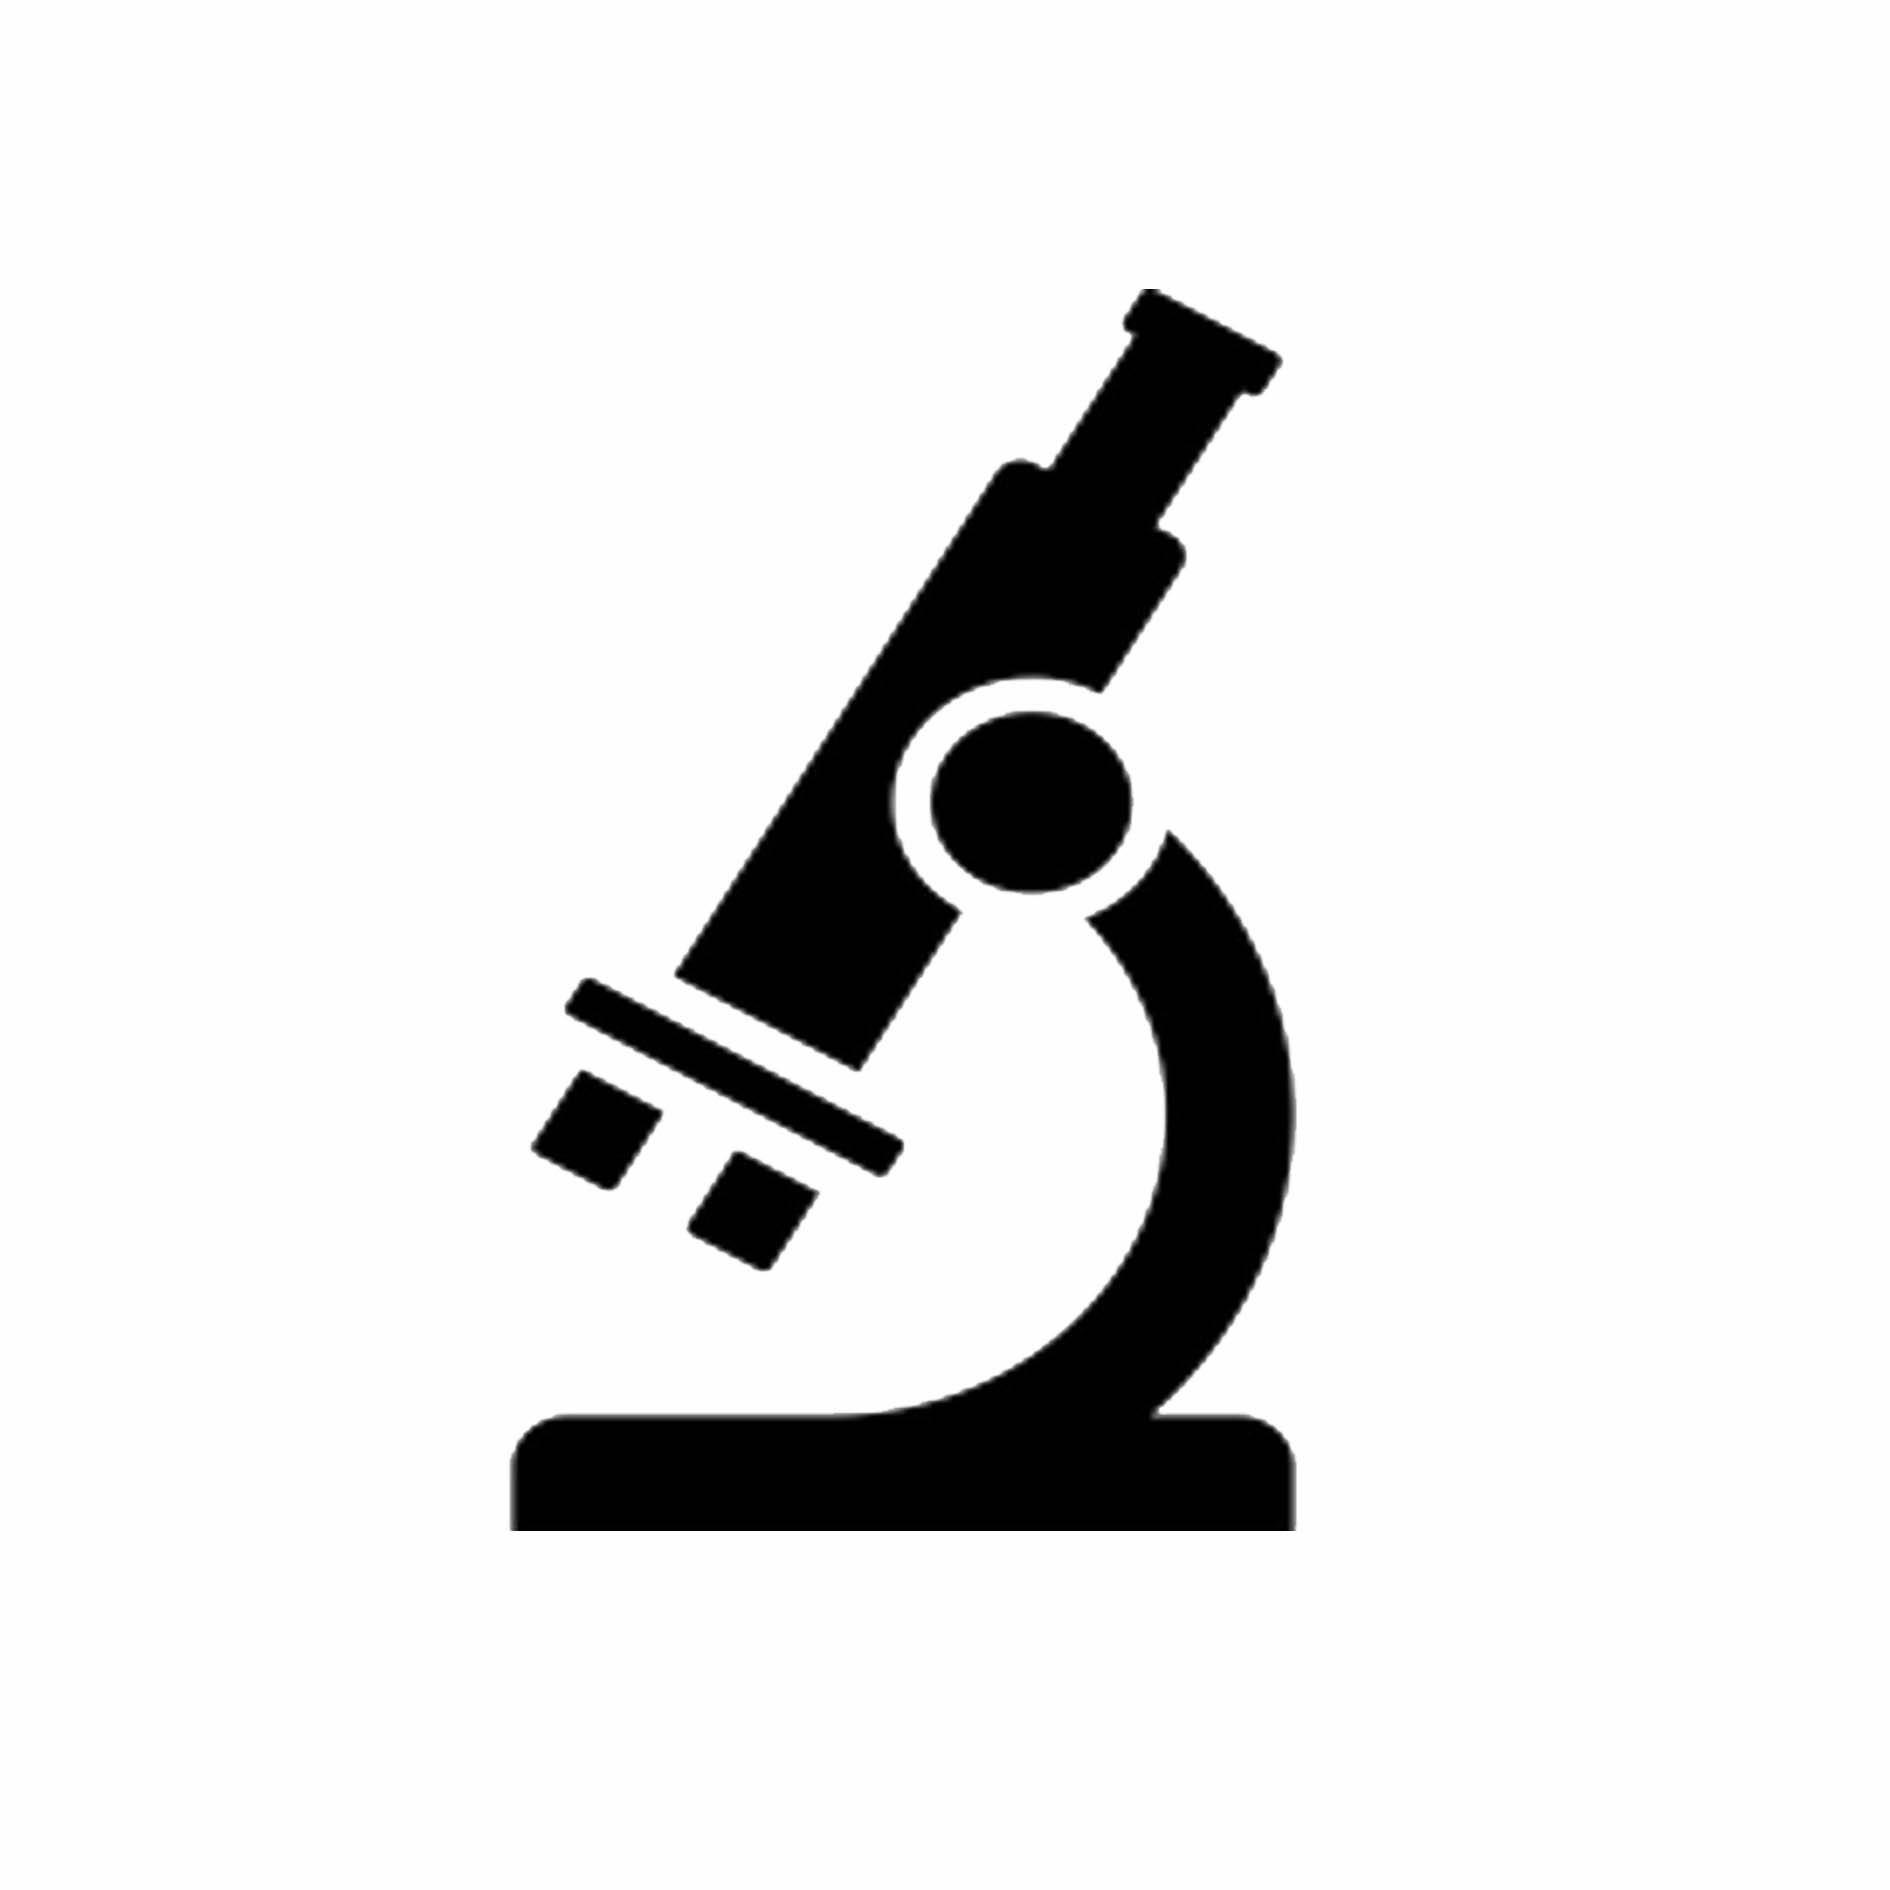 microscope icon 3